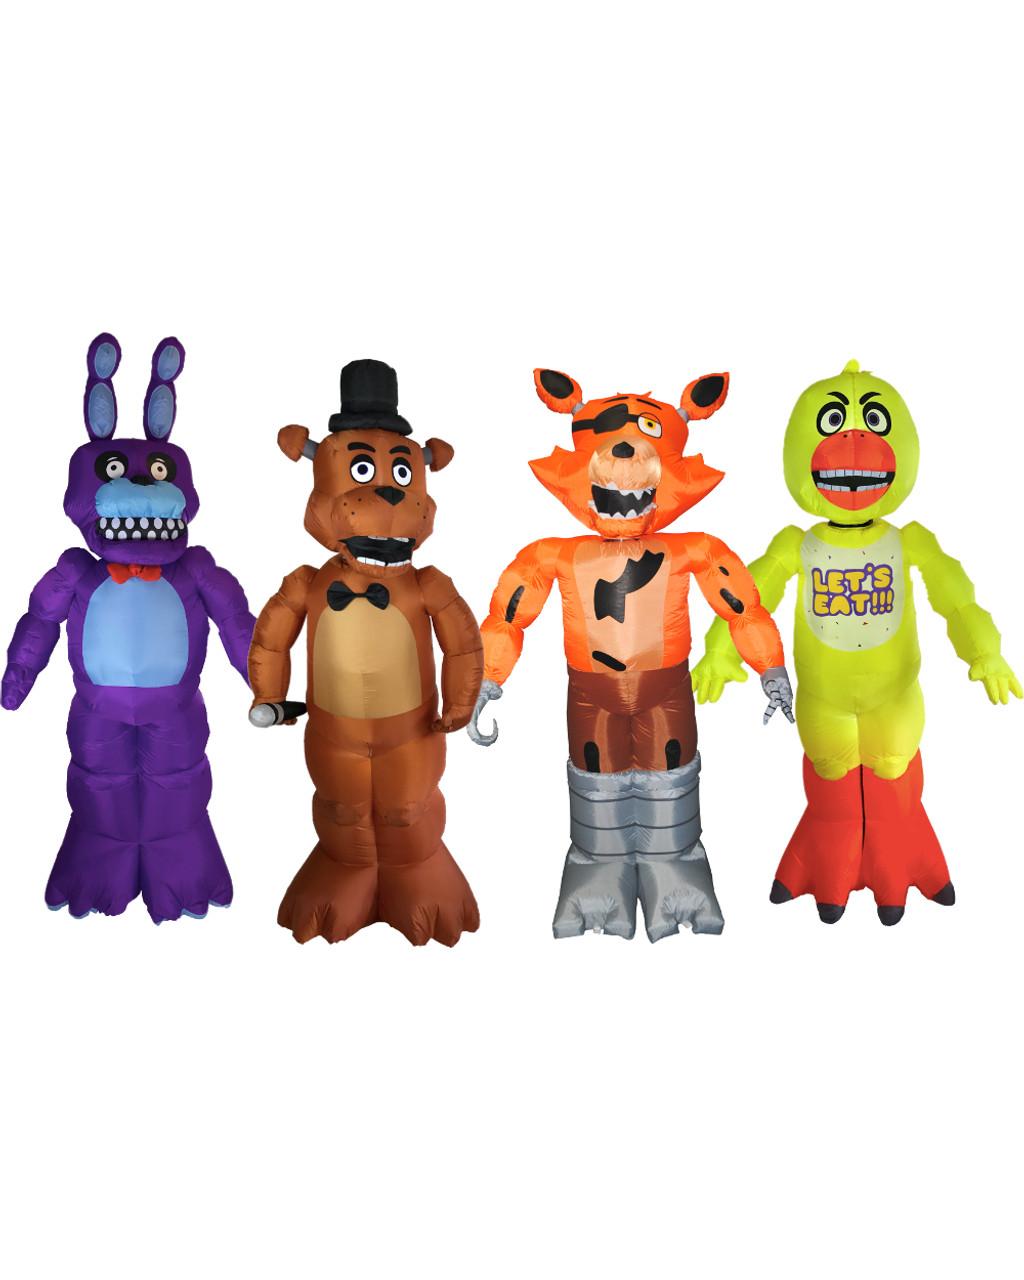 Five Nights At Freddy's Bonnie Animated five nights at freddy's all characters collectors animated yard decoration  bundle